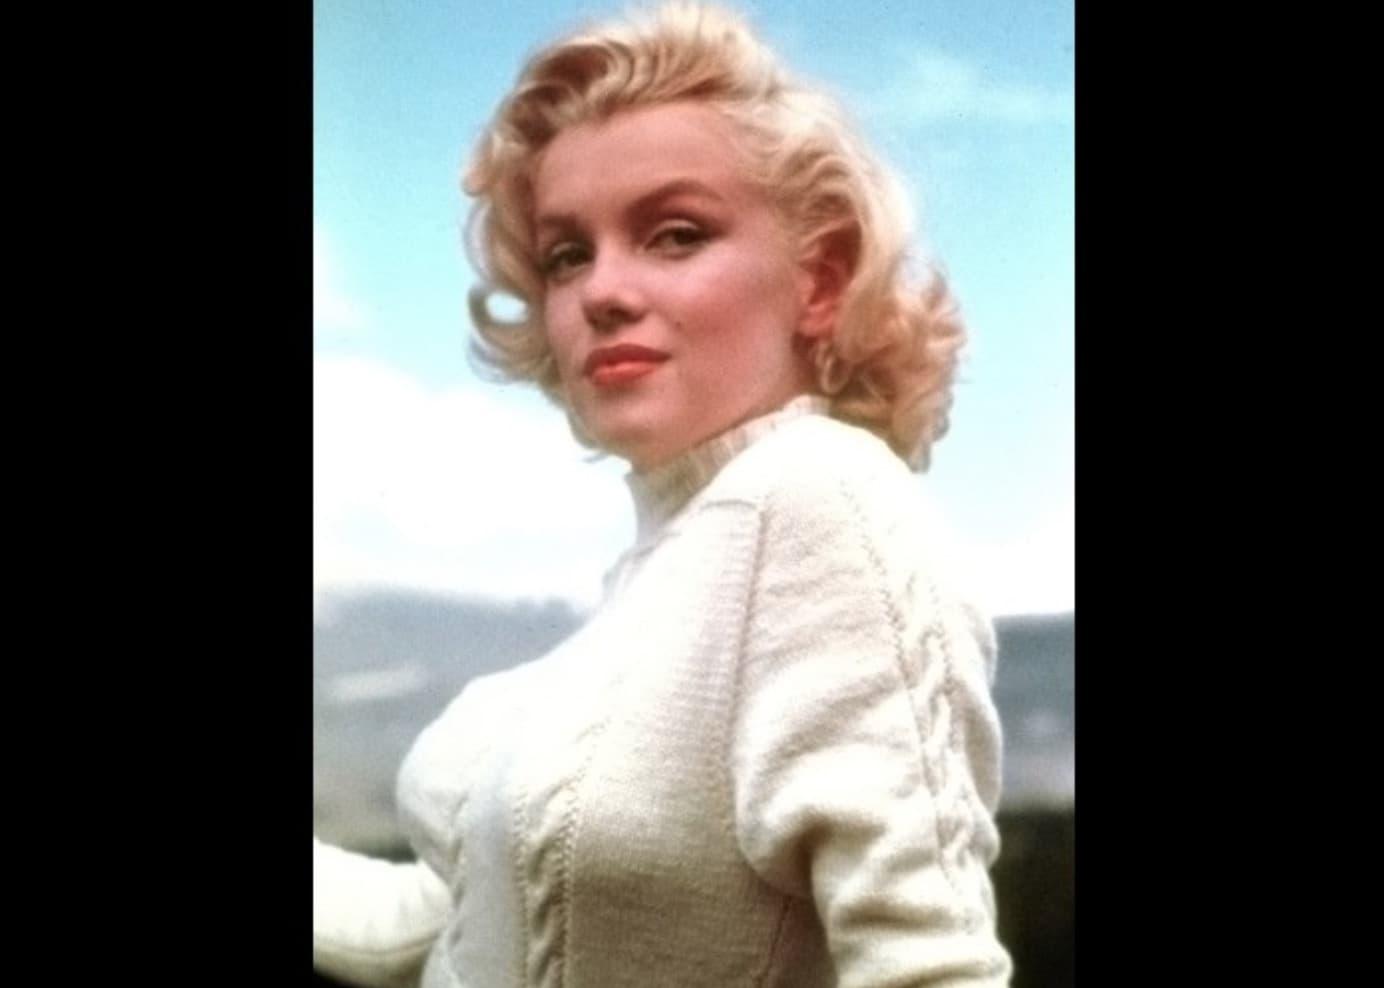 Marilyn Monroe İdeal Vücuda Sahipti